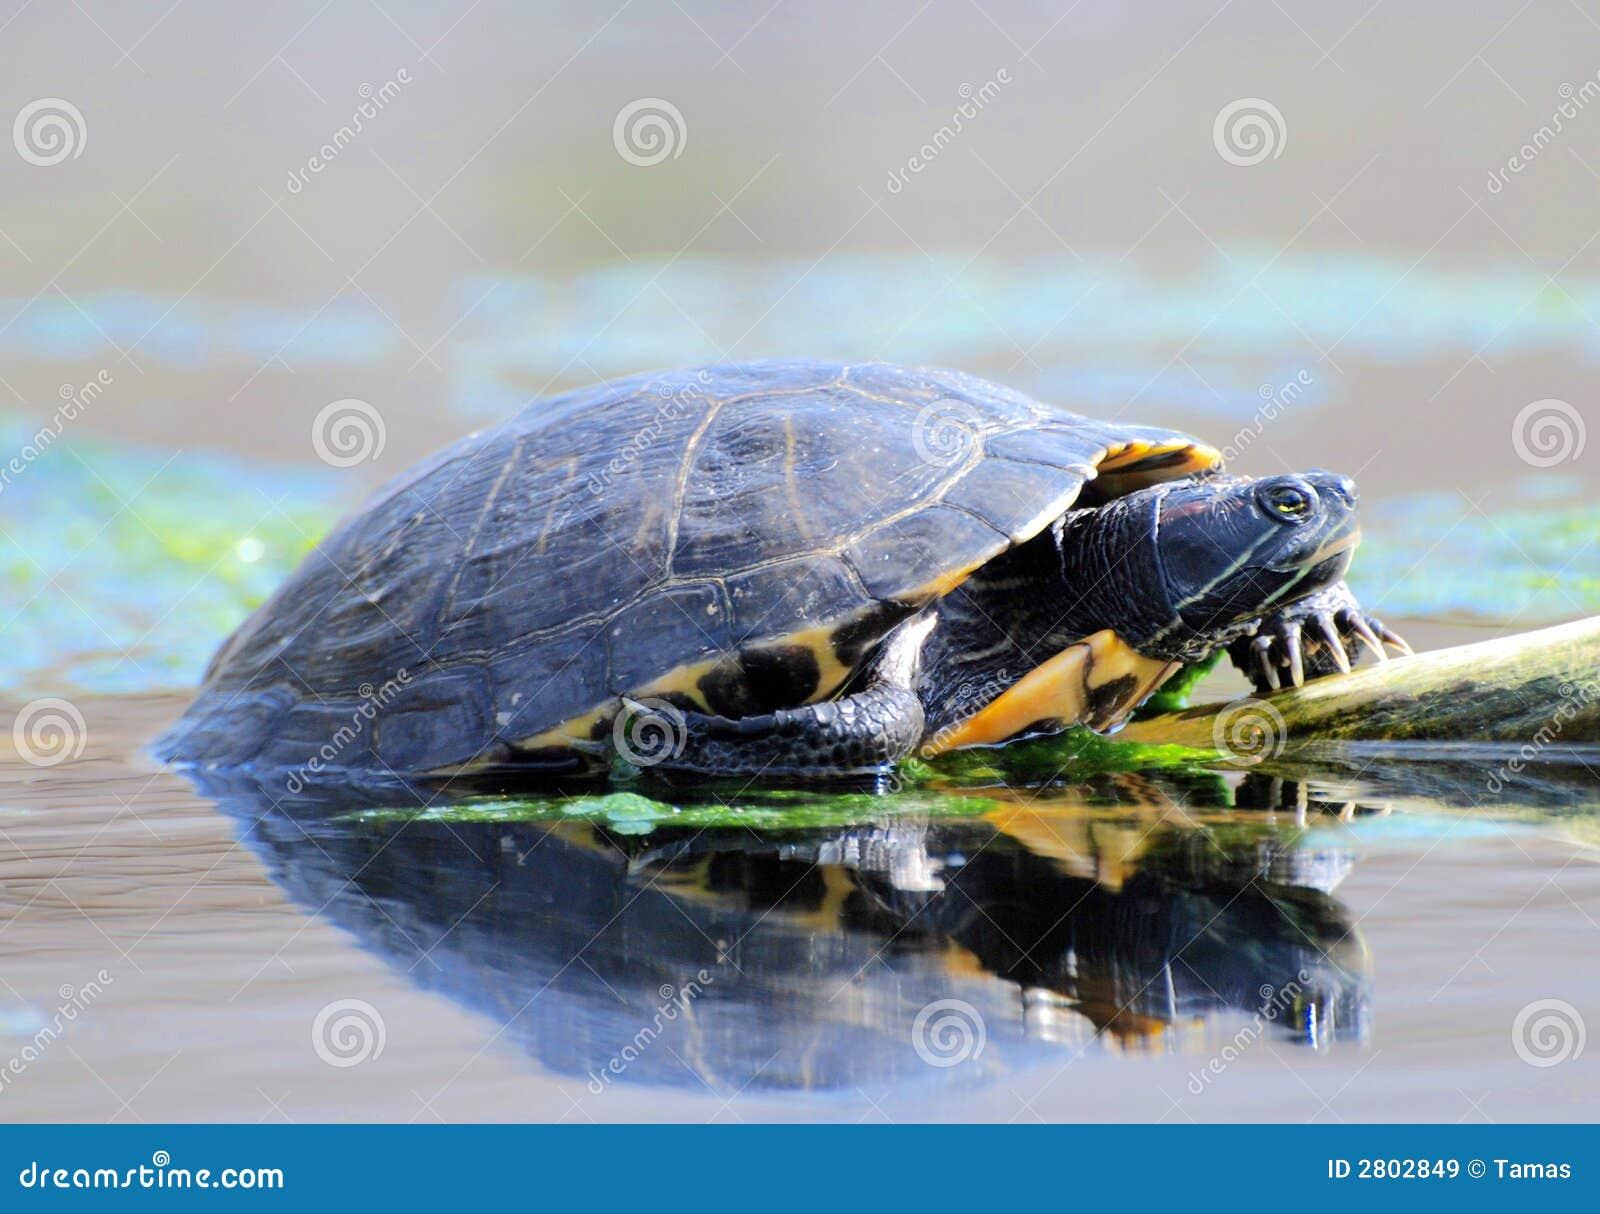 Water Turtles Royalty Free Stock Images - Image: 2802849